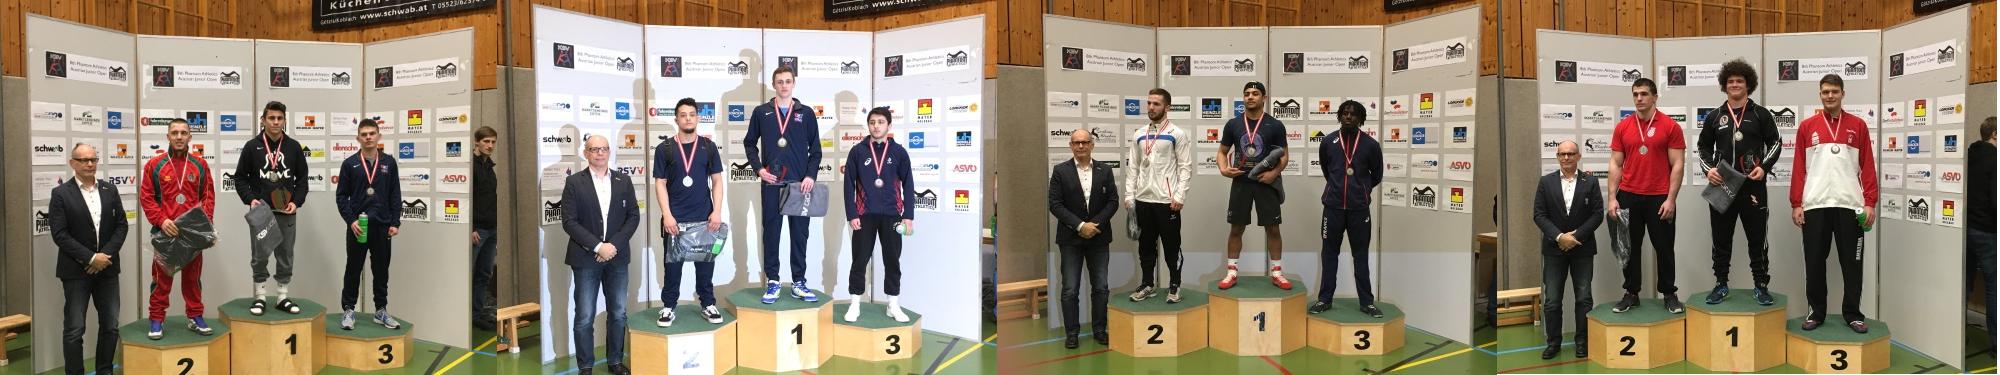 2018 austrian open us greco-roman champs